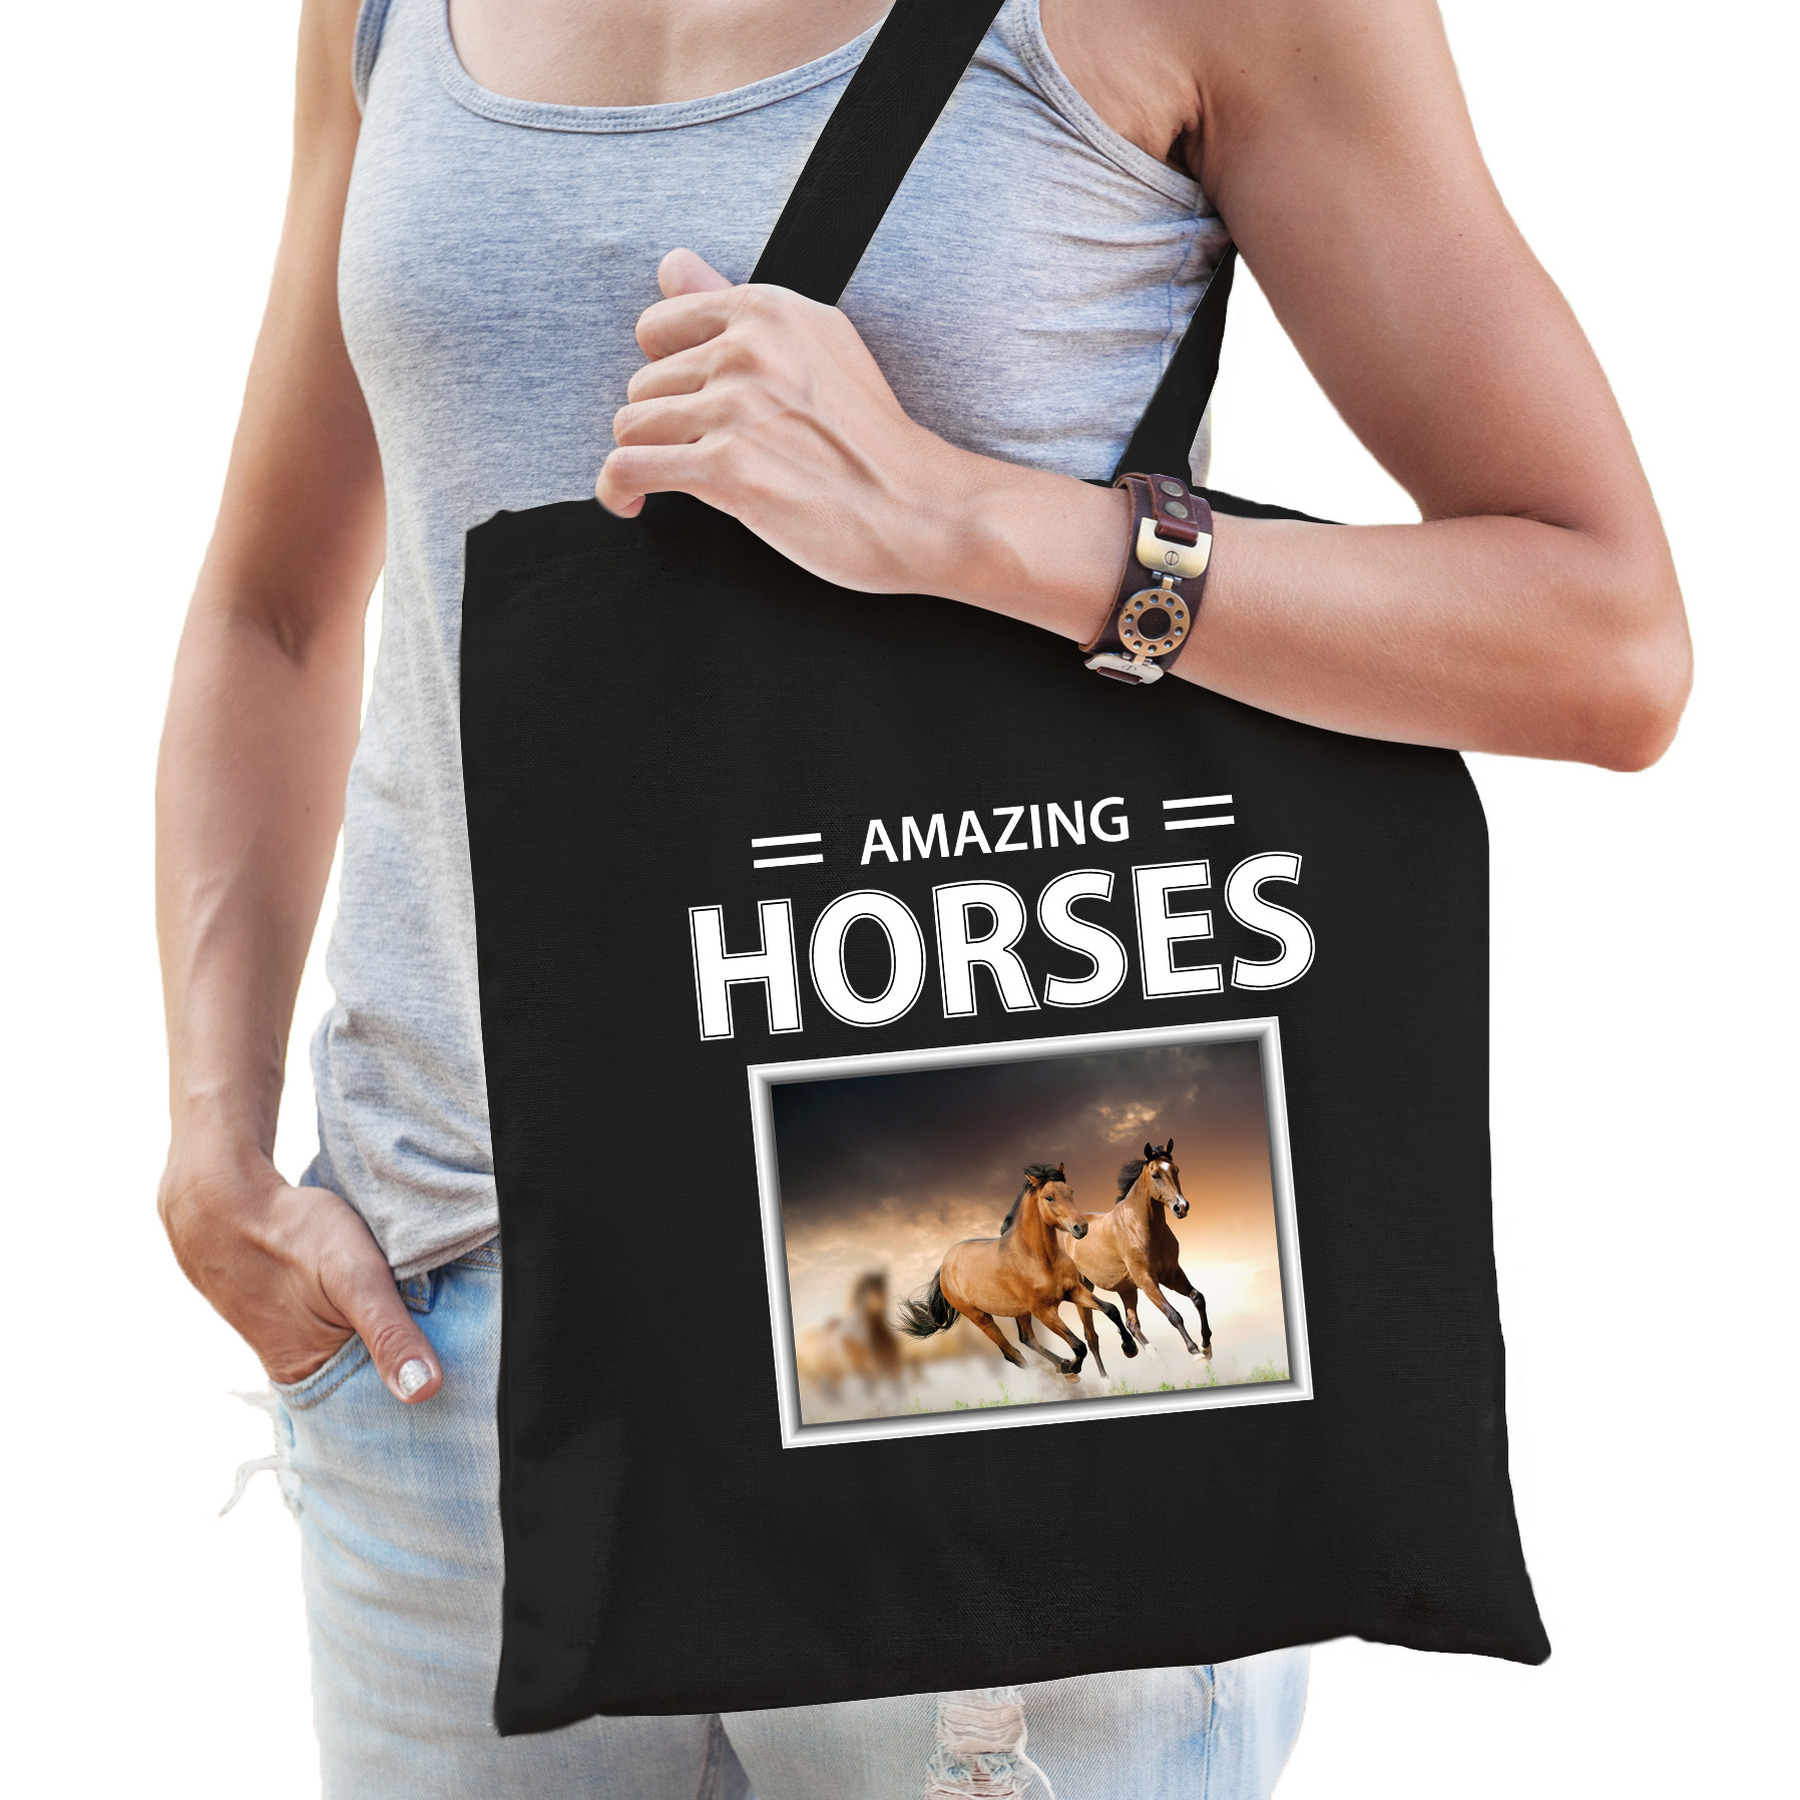 Katoenen tasje Bruine paarden zwart - amazing horses Bruin paard cadeau tas